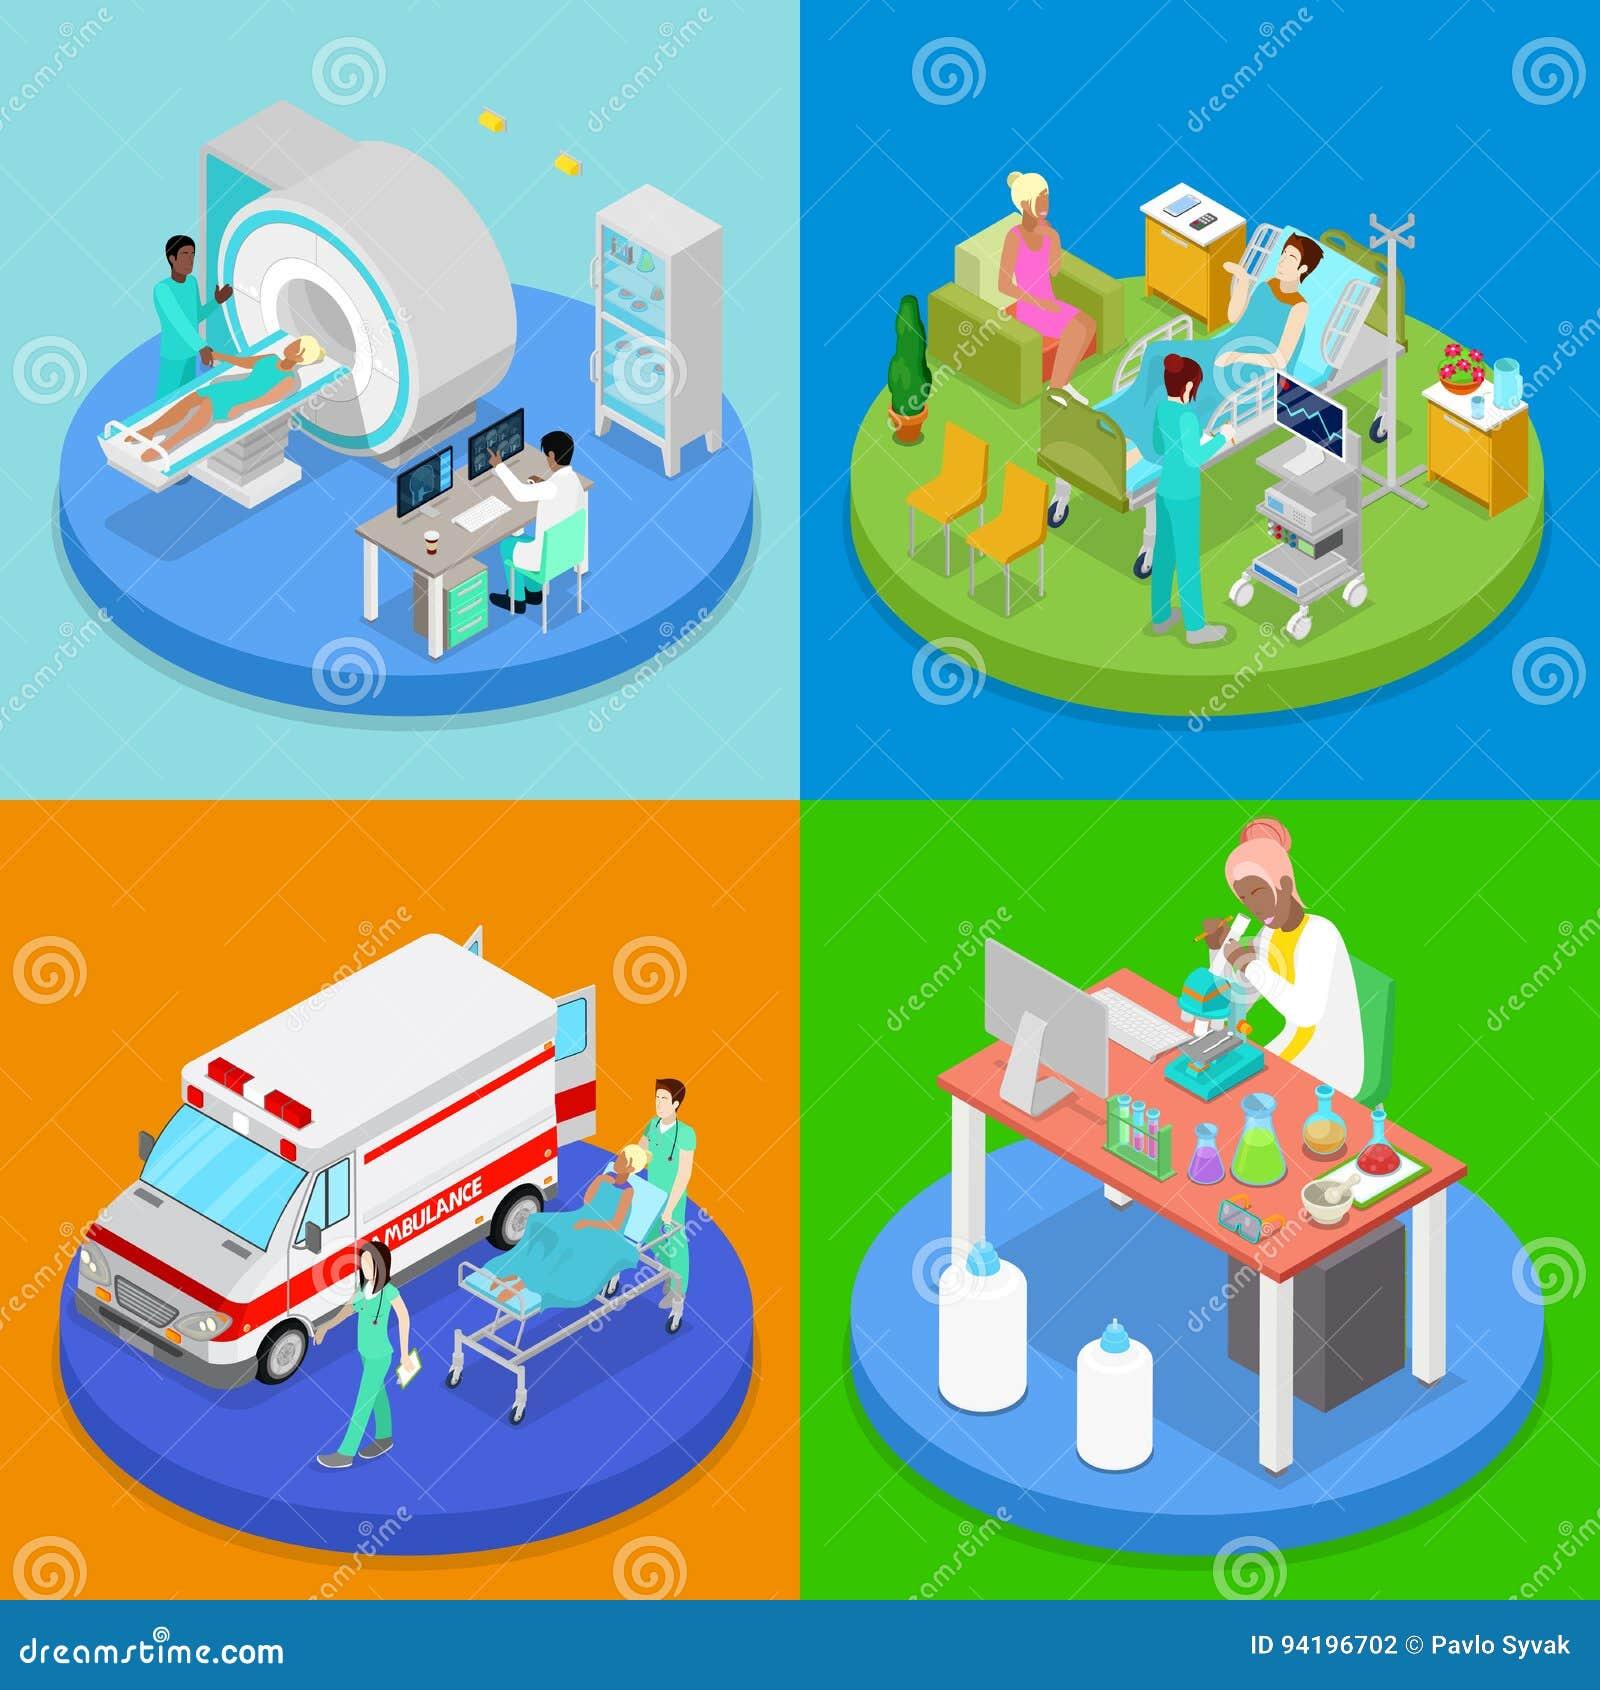 Isometric Medical Clinic. Health Care Concept. Hospital Room, Ambulance Emergency Service, MRI